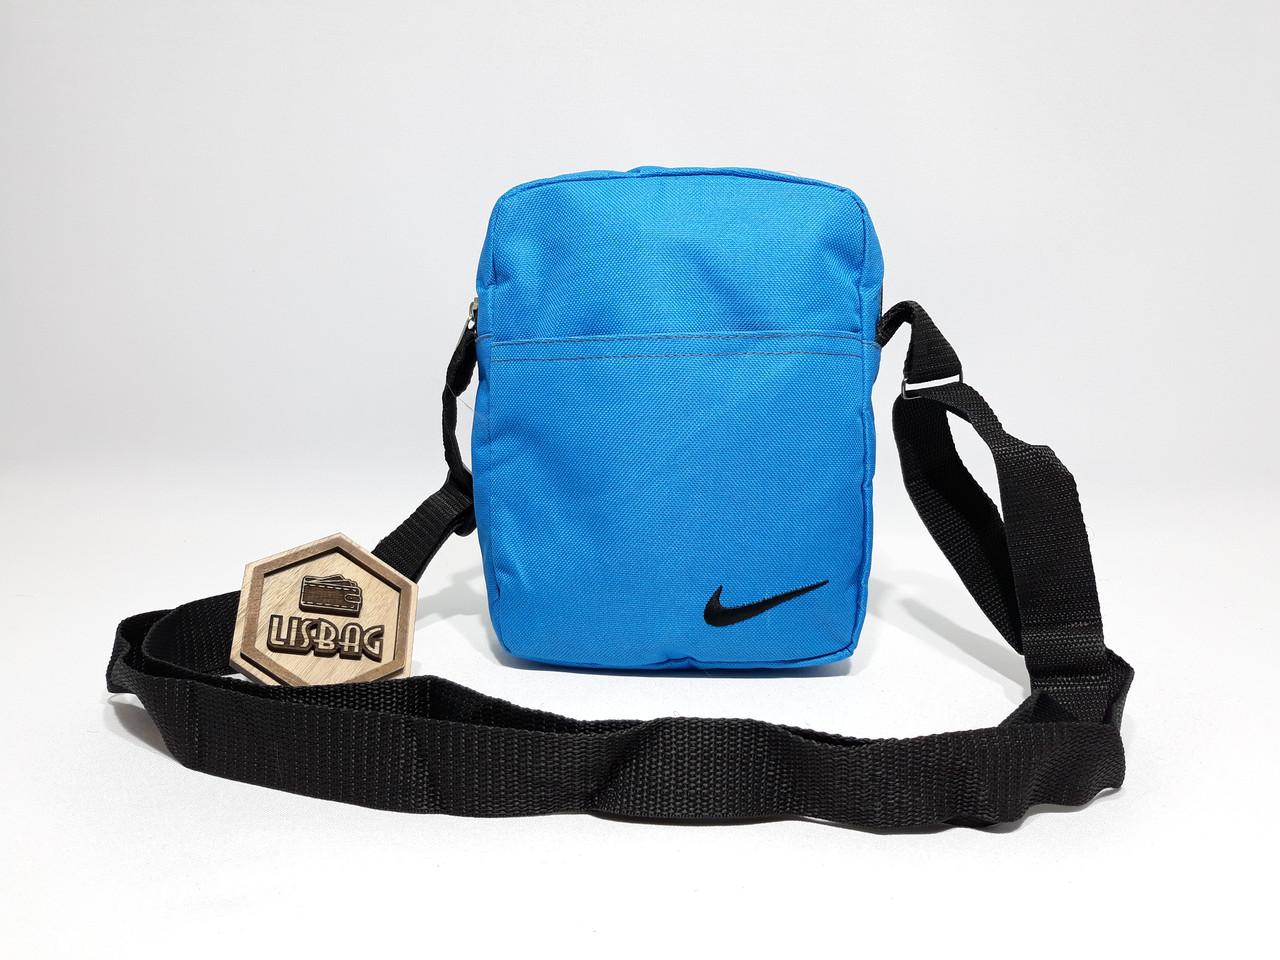 9d4db2a6d2df ... Мужская сумка планшетка/мессенджер через плечо Nike копия, голубая,  фото 4 ...